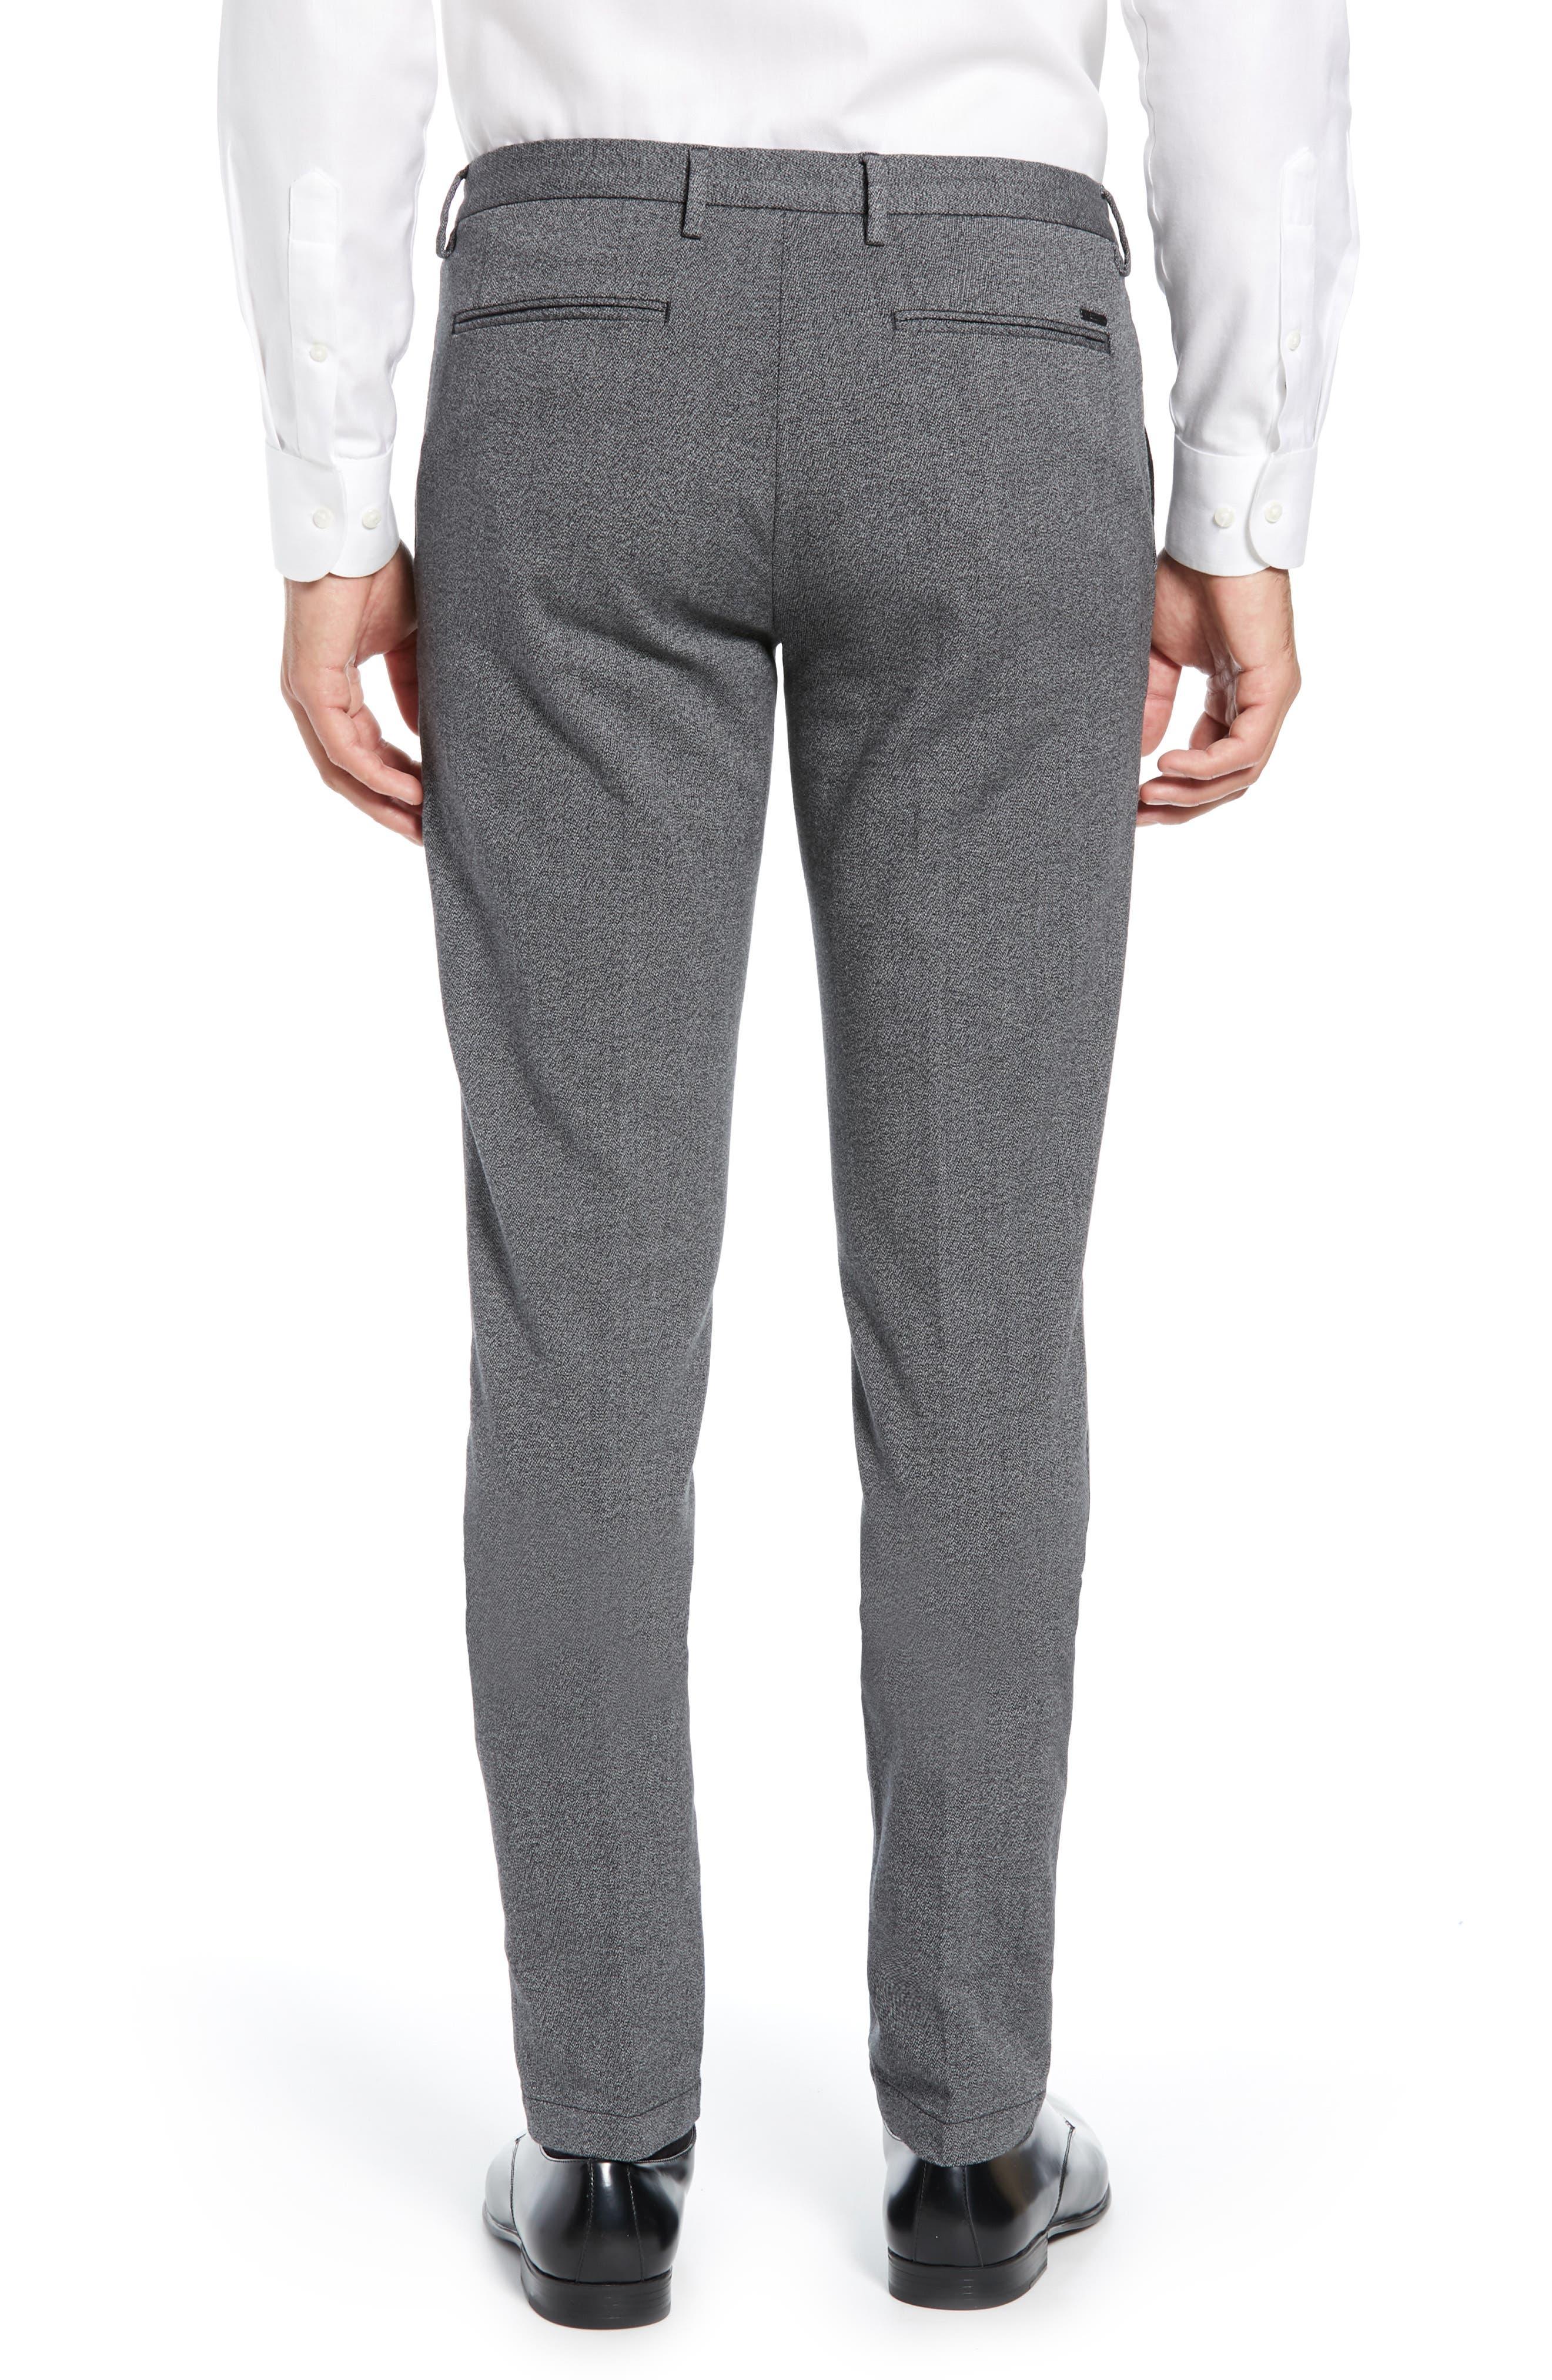 Kaito Slim Fit Twill Trousers,                             Alternate thumbnail 2, color,                             BLACK